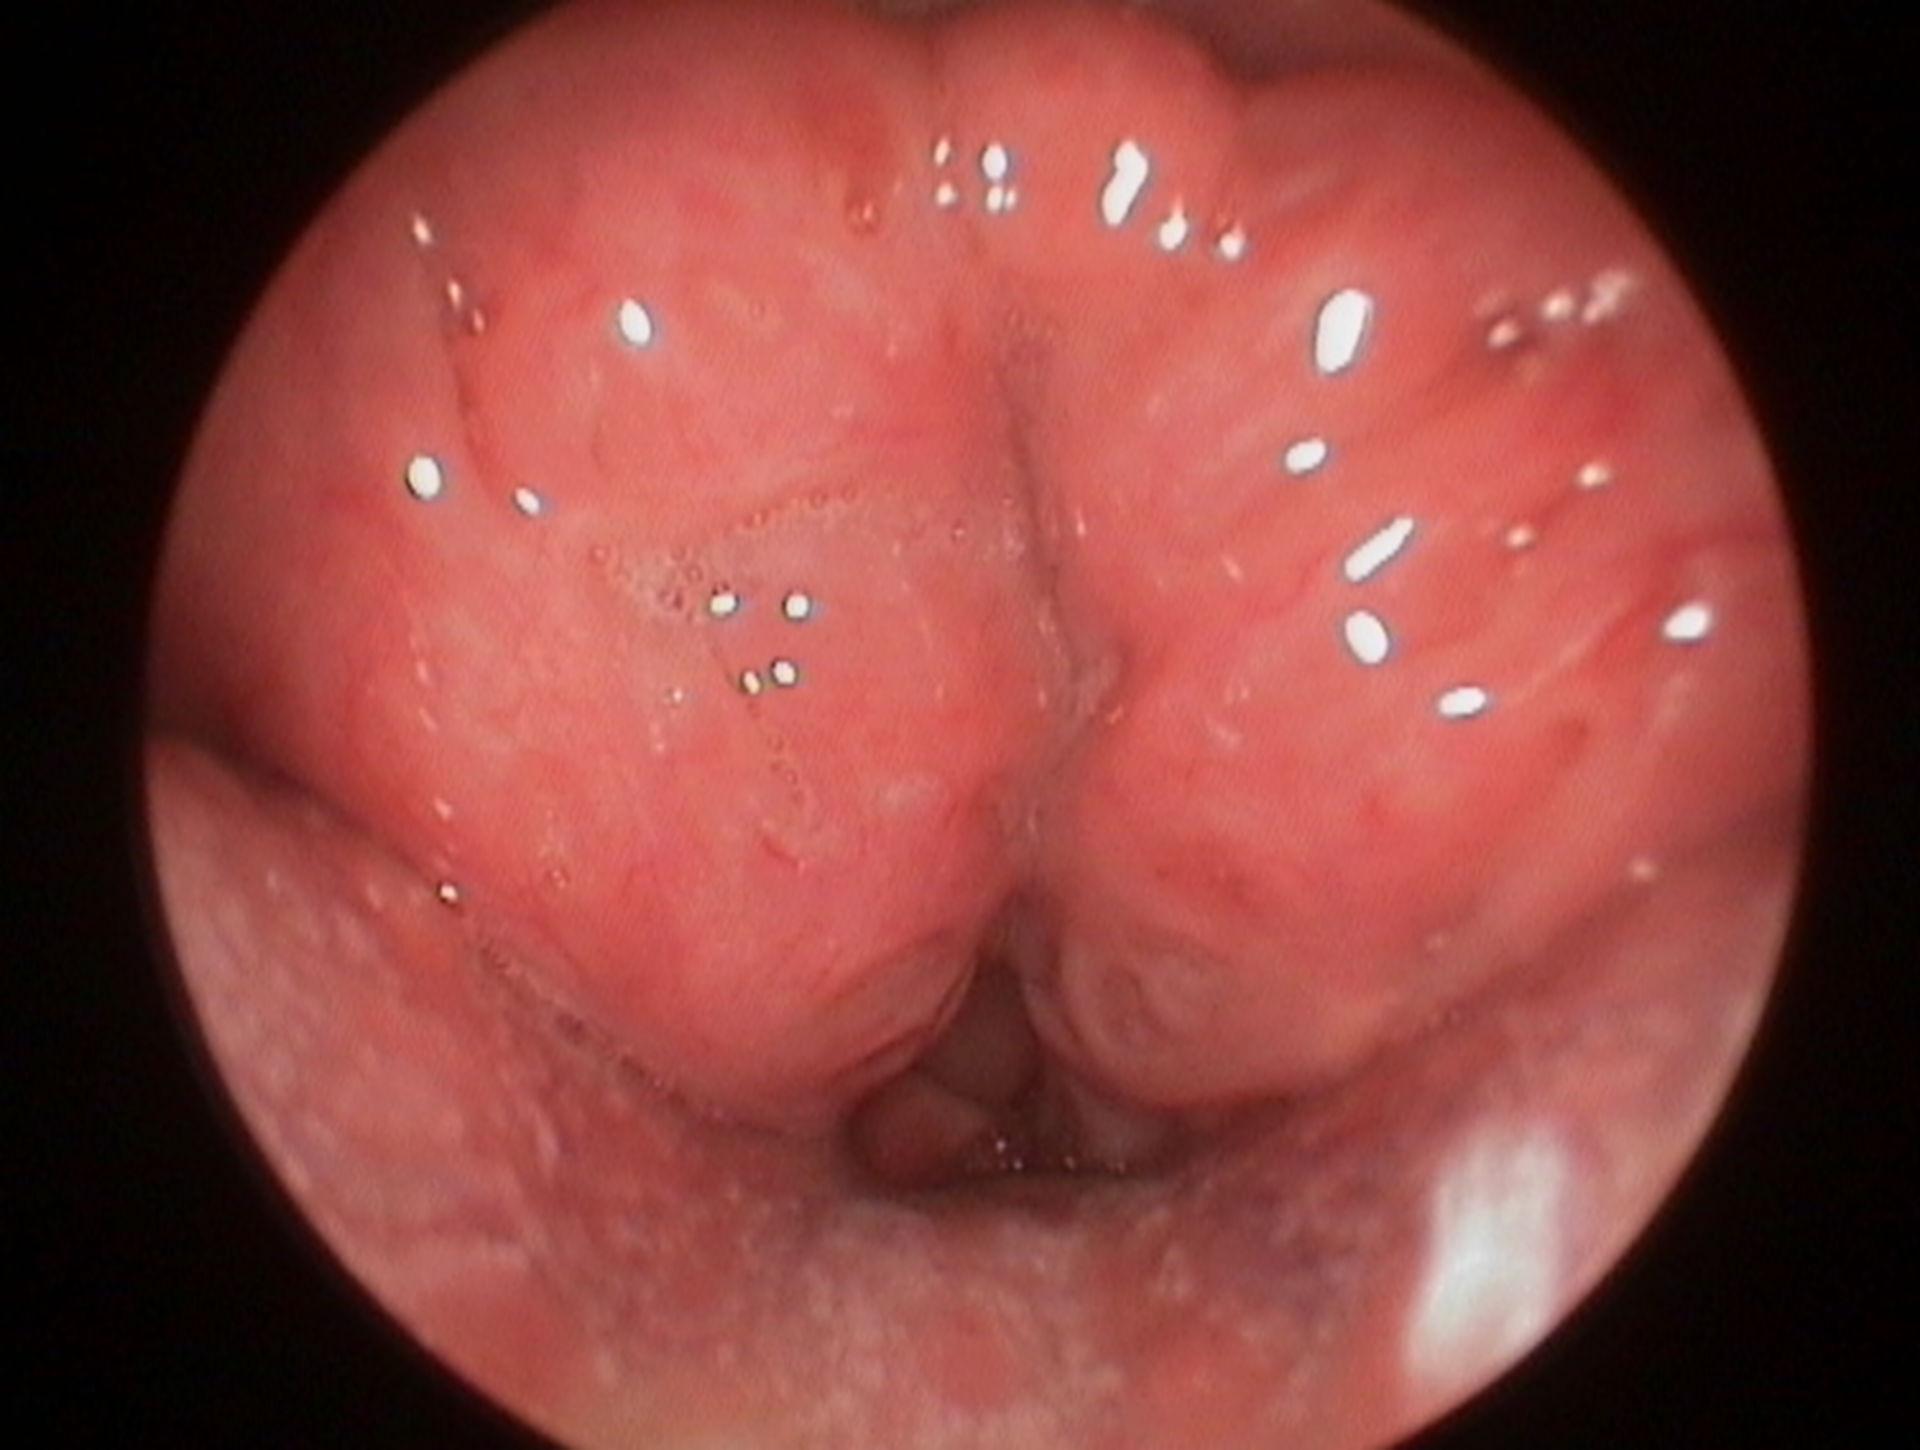 Giant neck tonsils